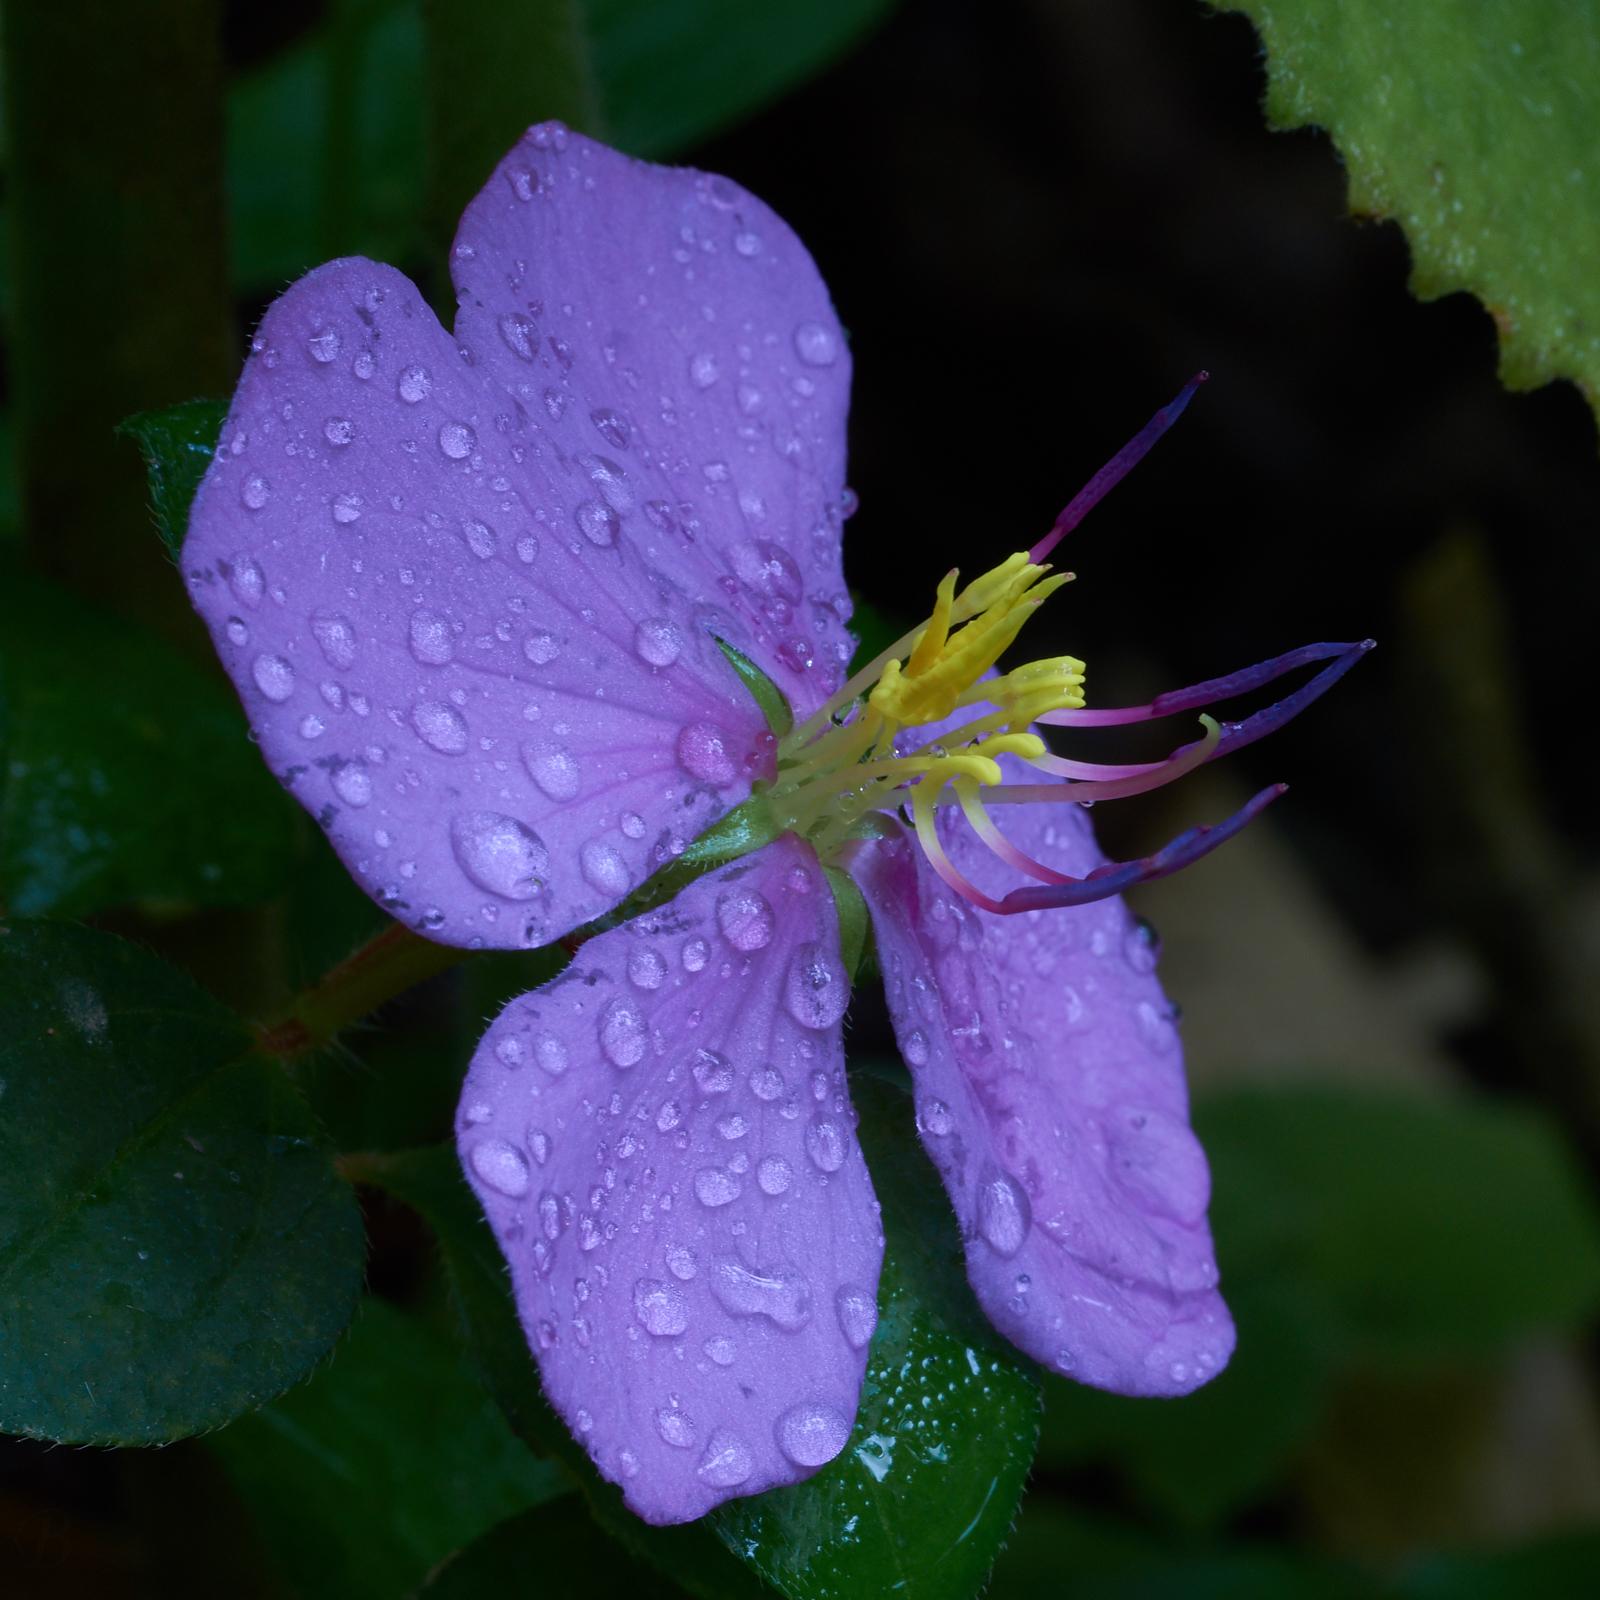 Robert Brown, macro photography, purple flower,Philippines